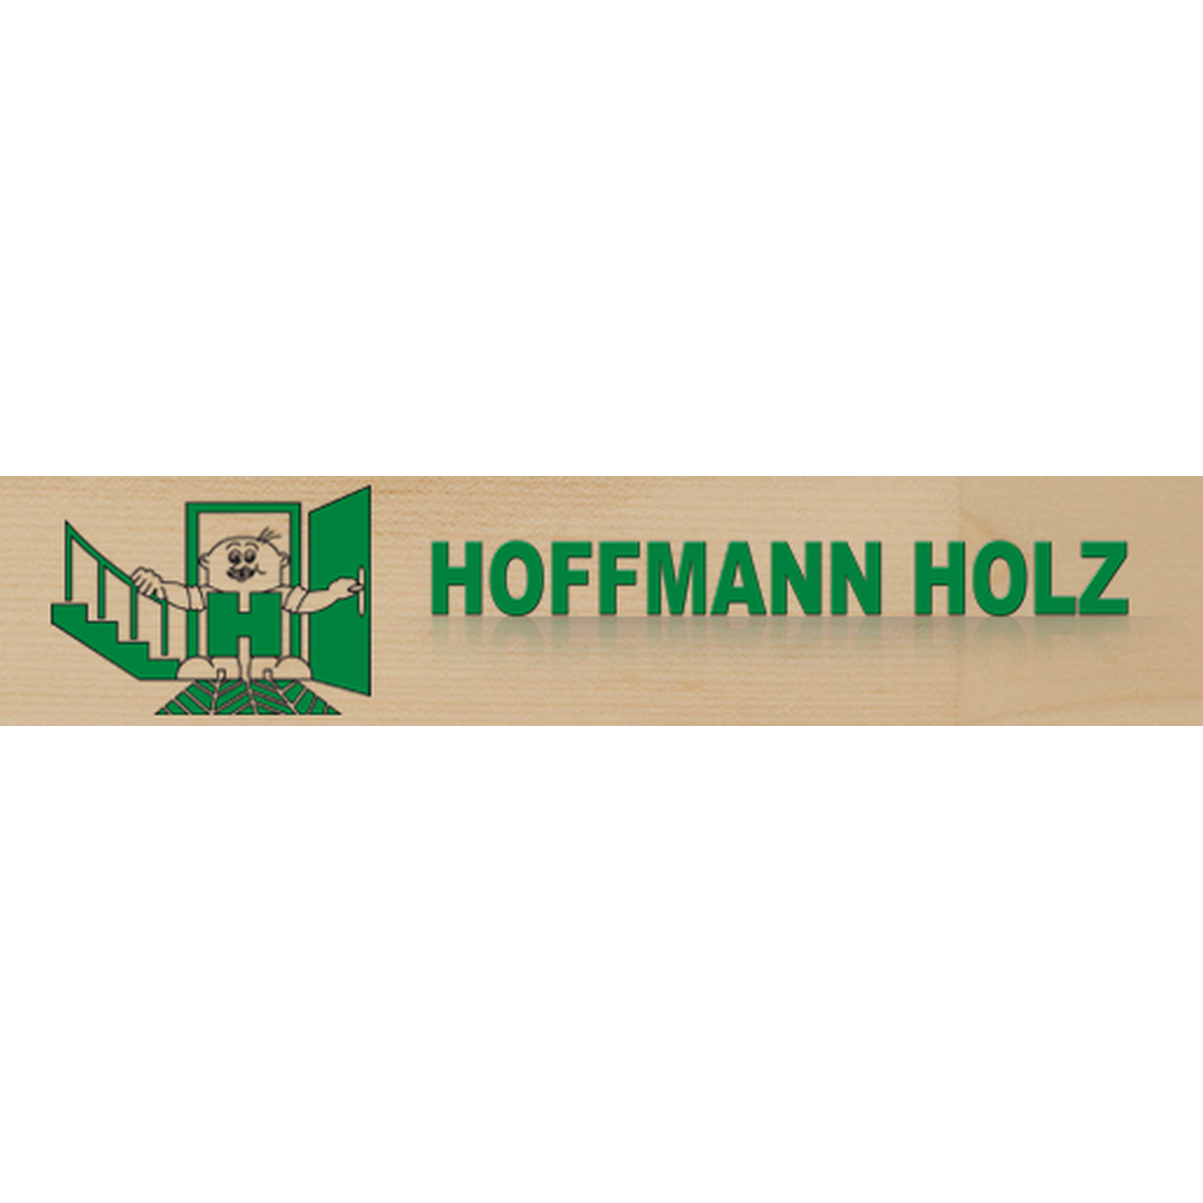 Friedrich Hoffmann & Sohn GmbH